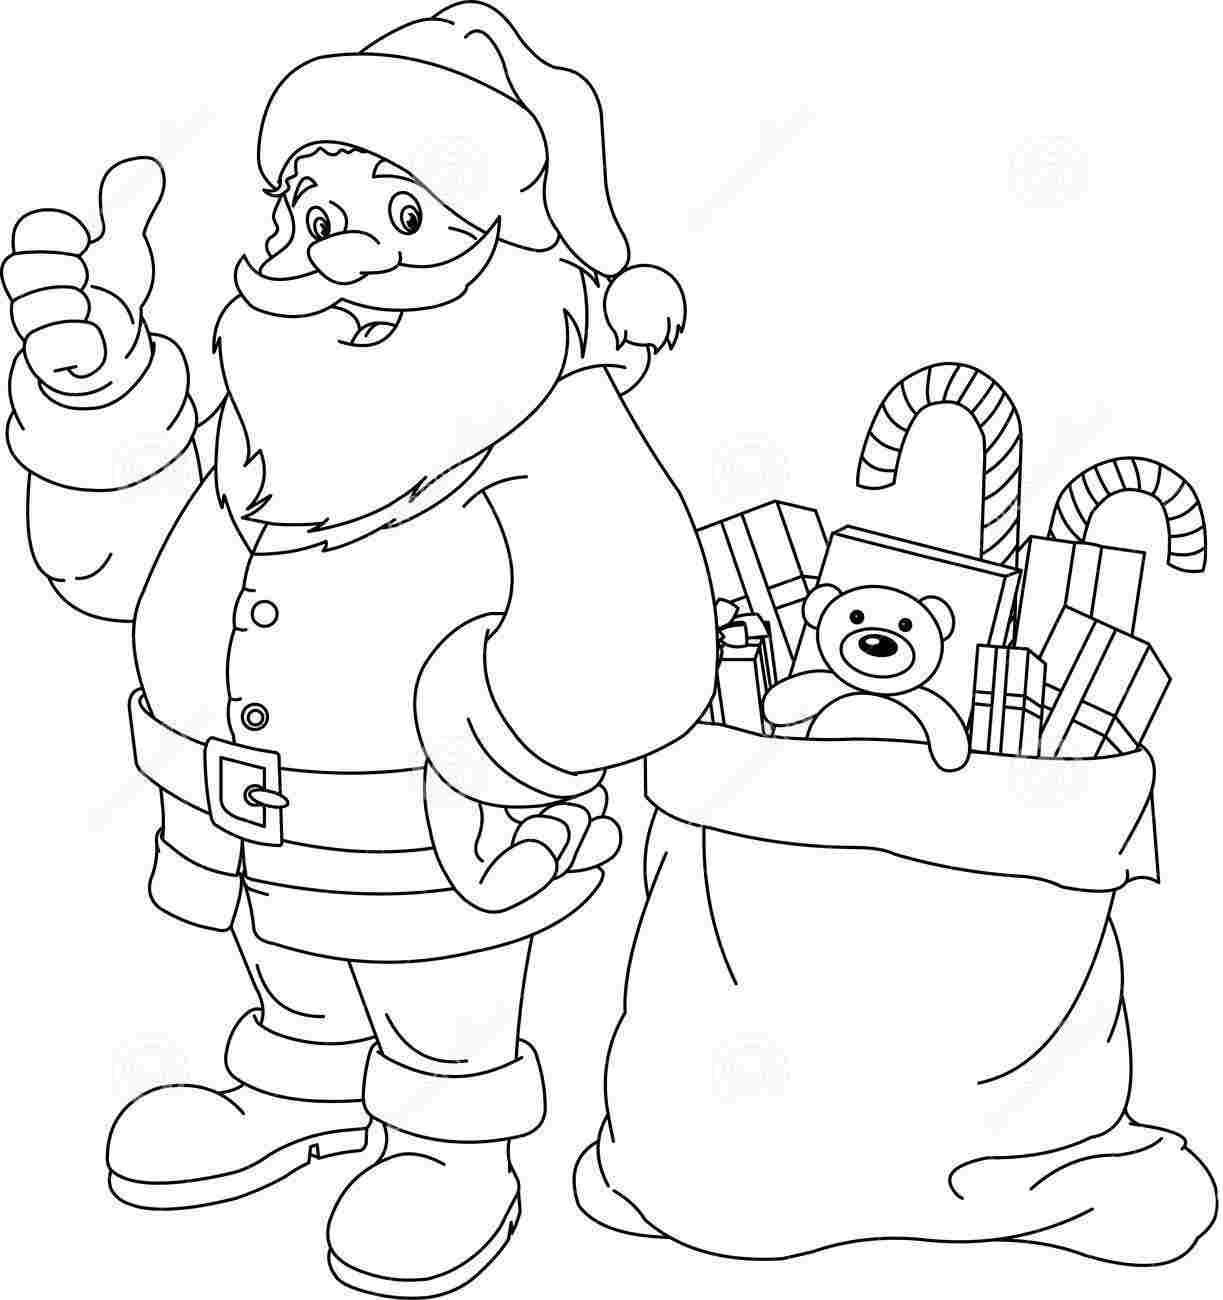 Drawn santa christmas coloring page Coloring For Coloring  Coloring